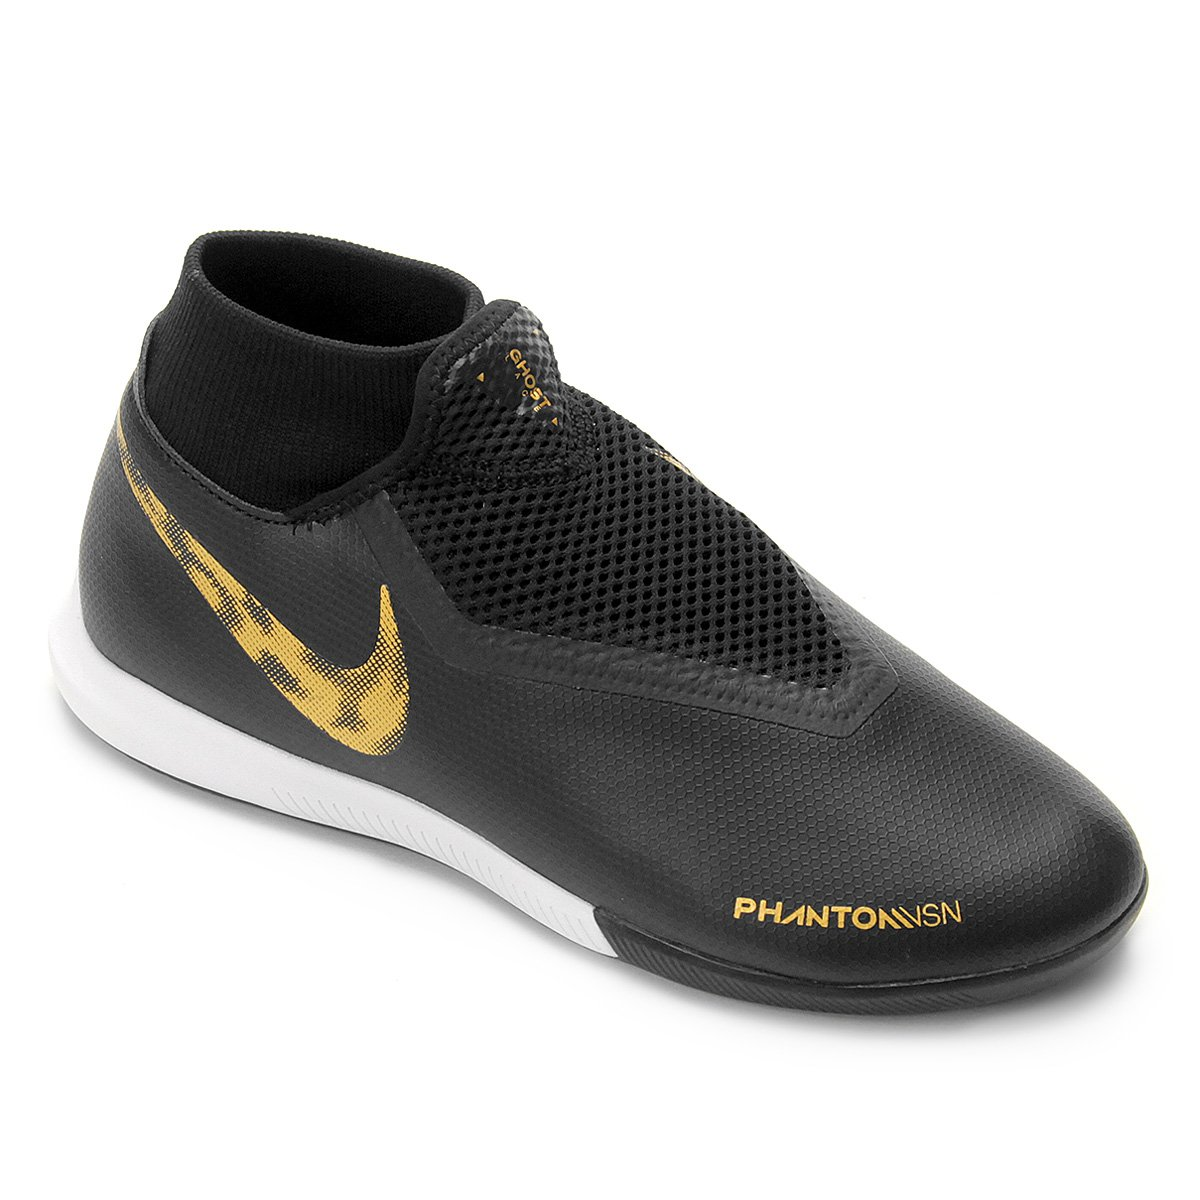 7147f09516 Chuteira Futsal Nike Phantom Vison Academy DF IC - Preto e Dourado ...